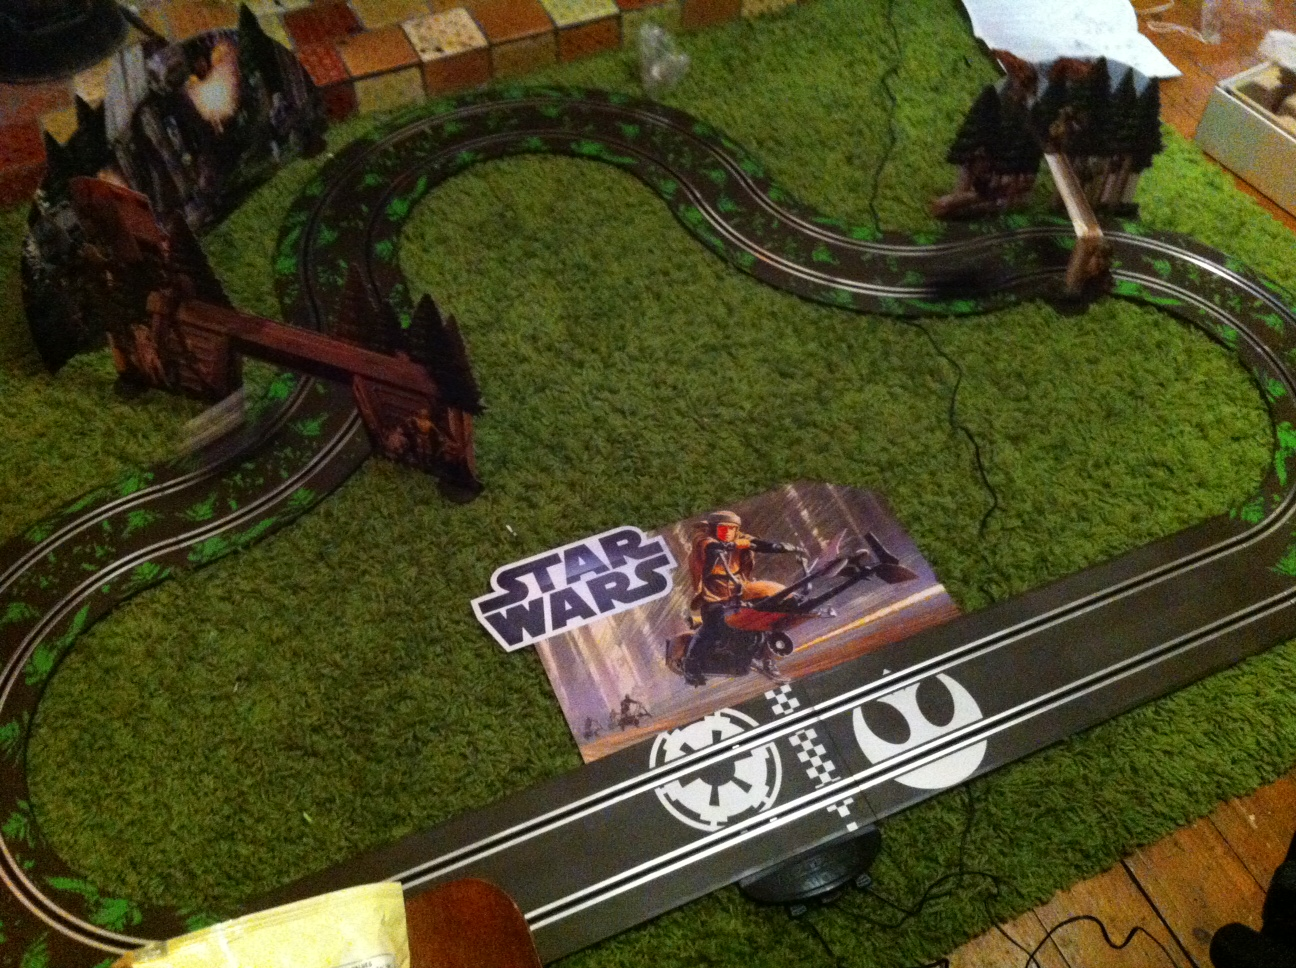 Star Wars Endor Scalextric Set